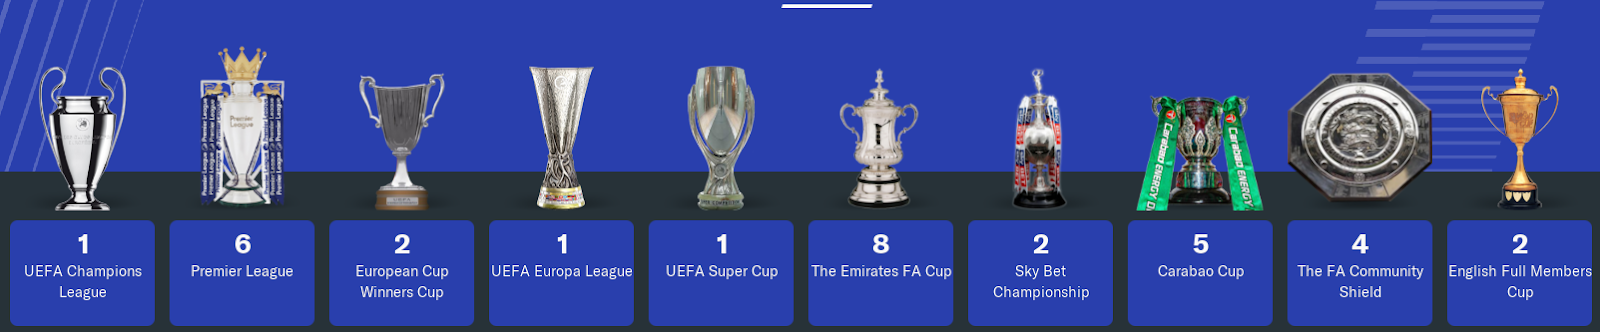 FM19 - Chelsea FC Team History